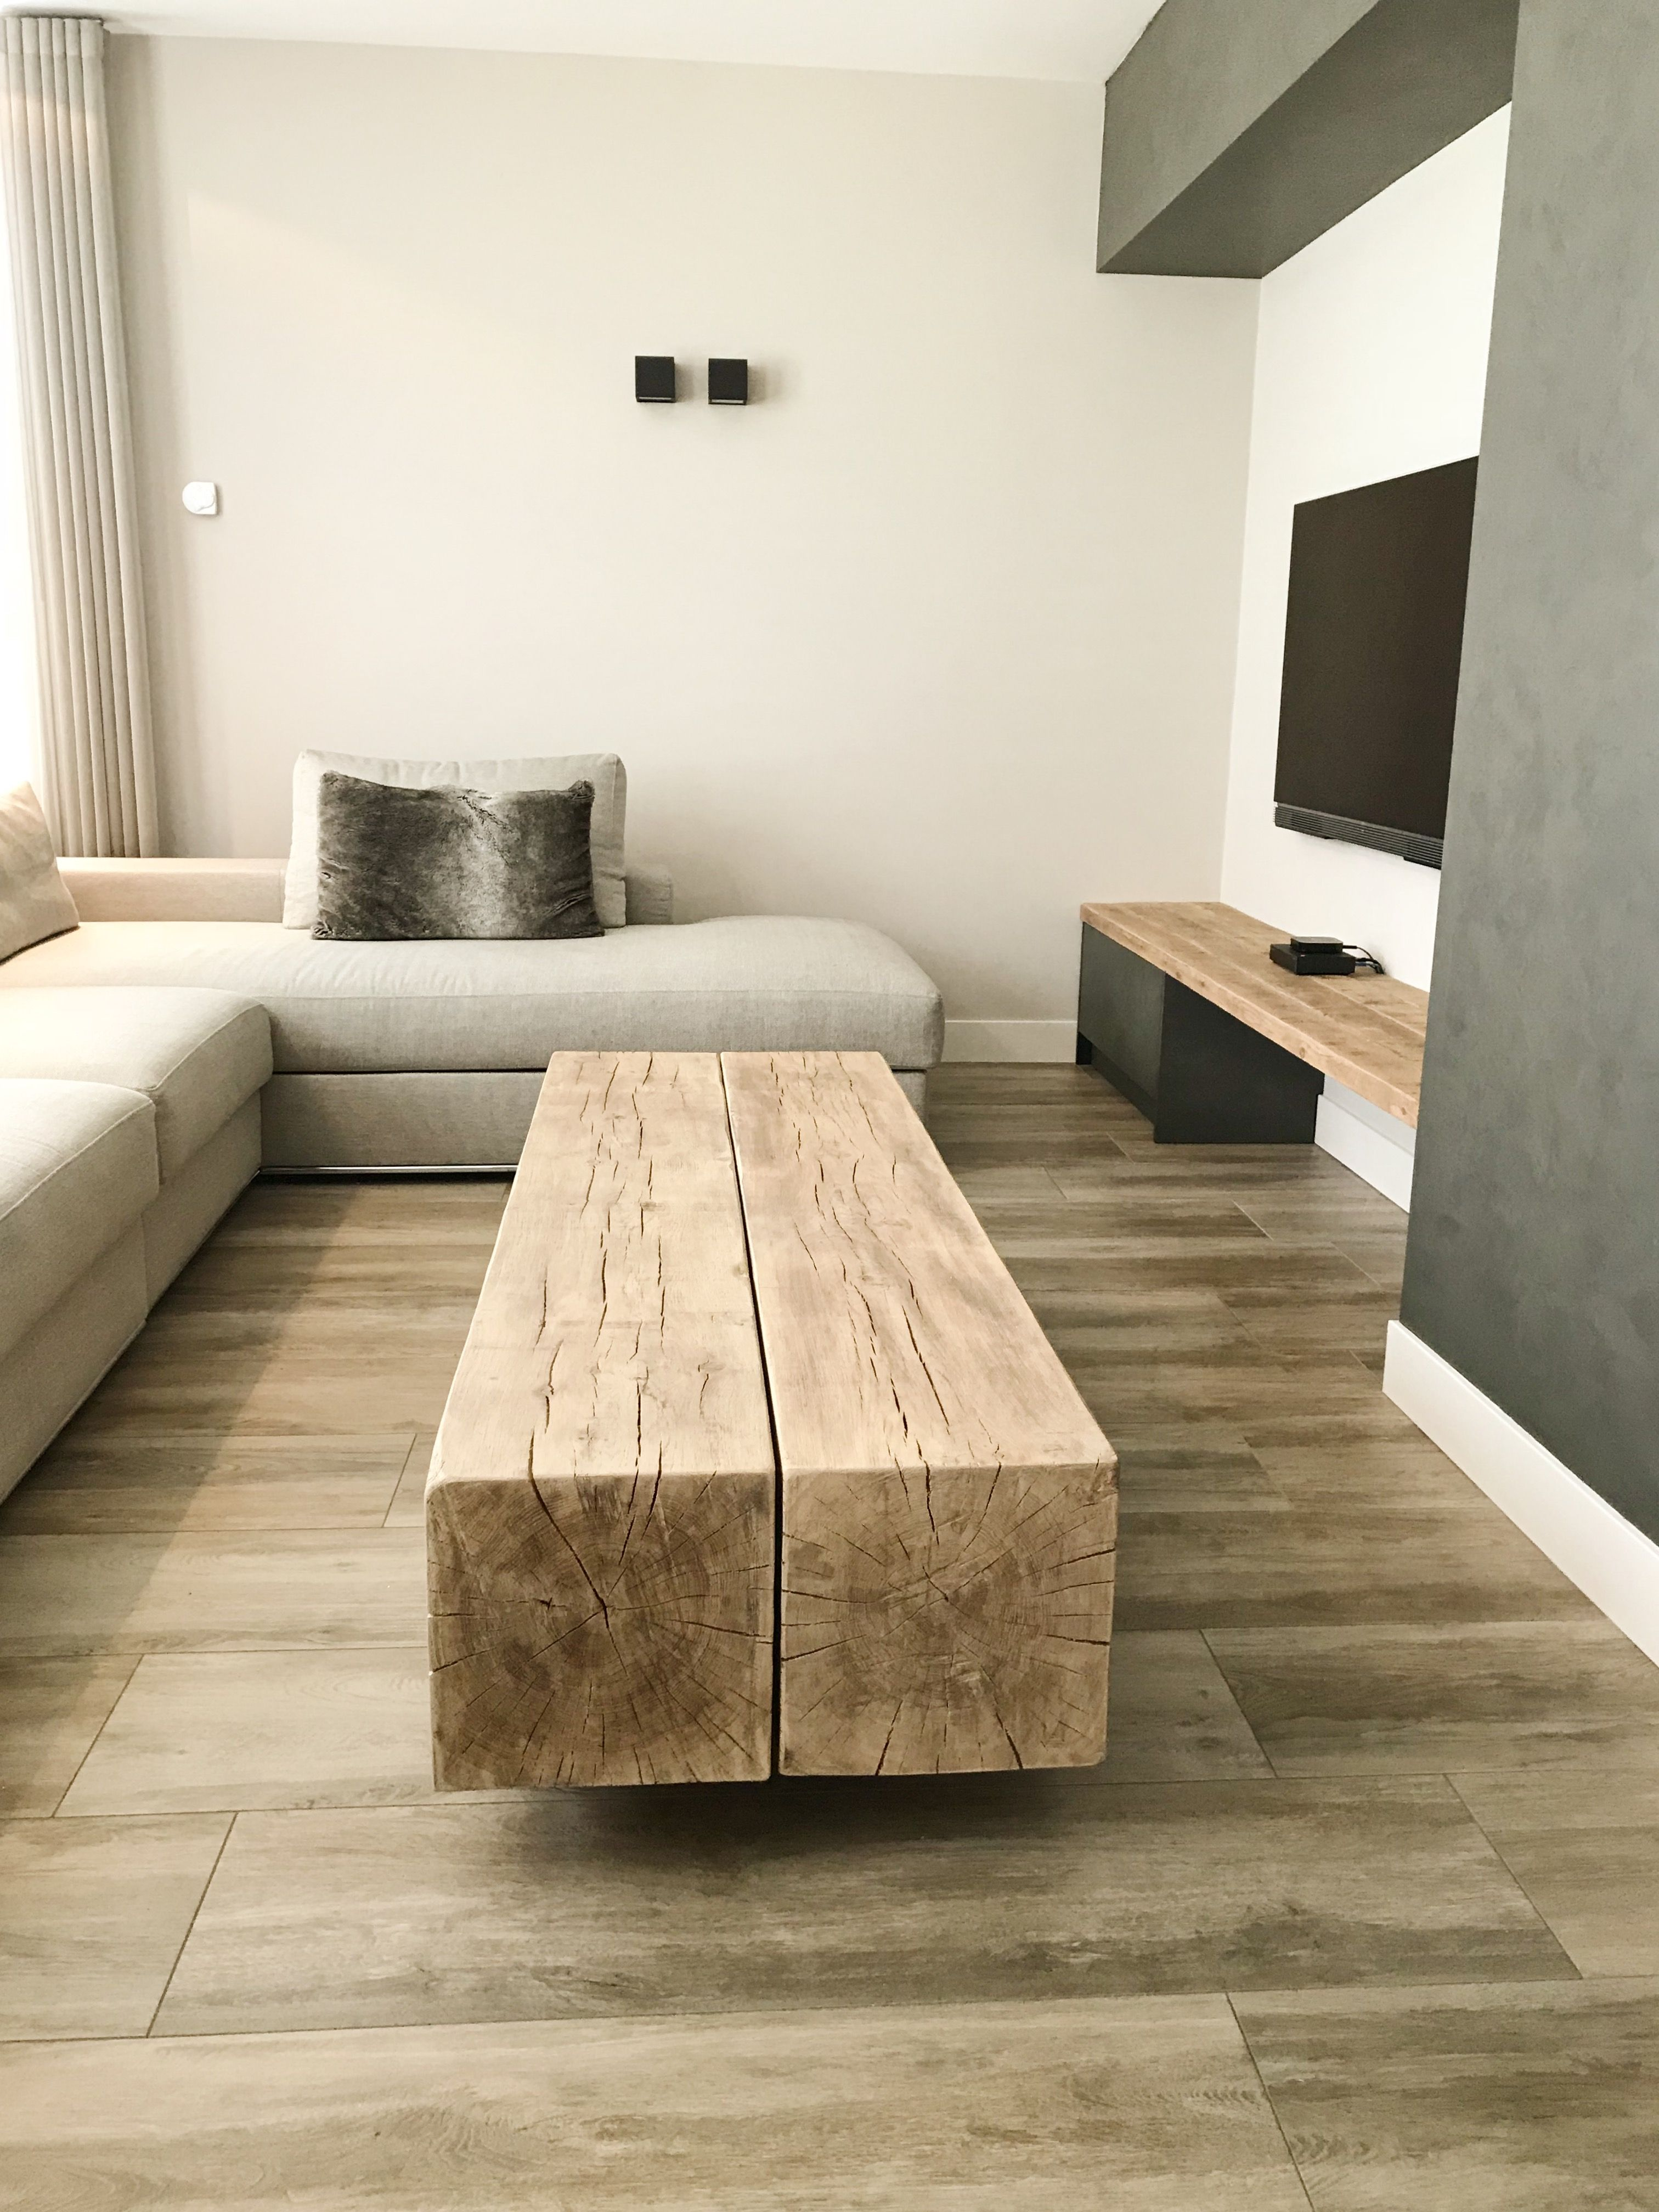 Fonkelnieuw Salontafel balk   Huis interieur, Interieur woonkamer, Woonkamer tafel HQ-29